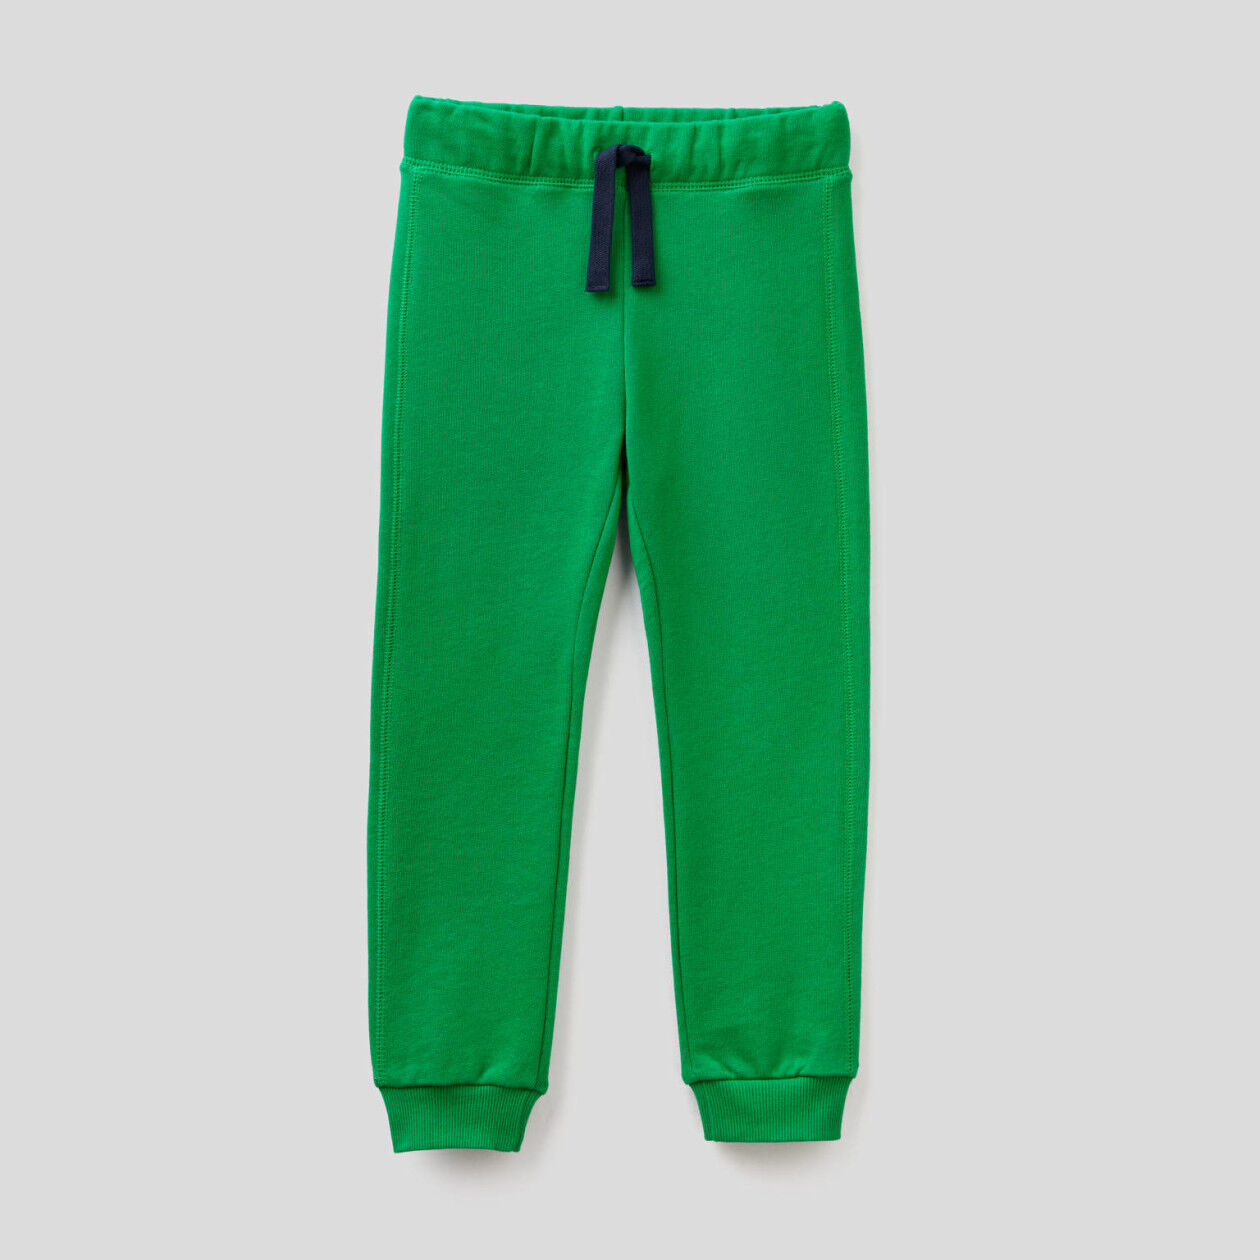 Boys Pantalone Jeans Z6ERJ United Colors of Benetton